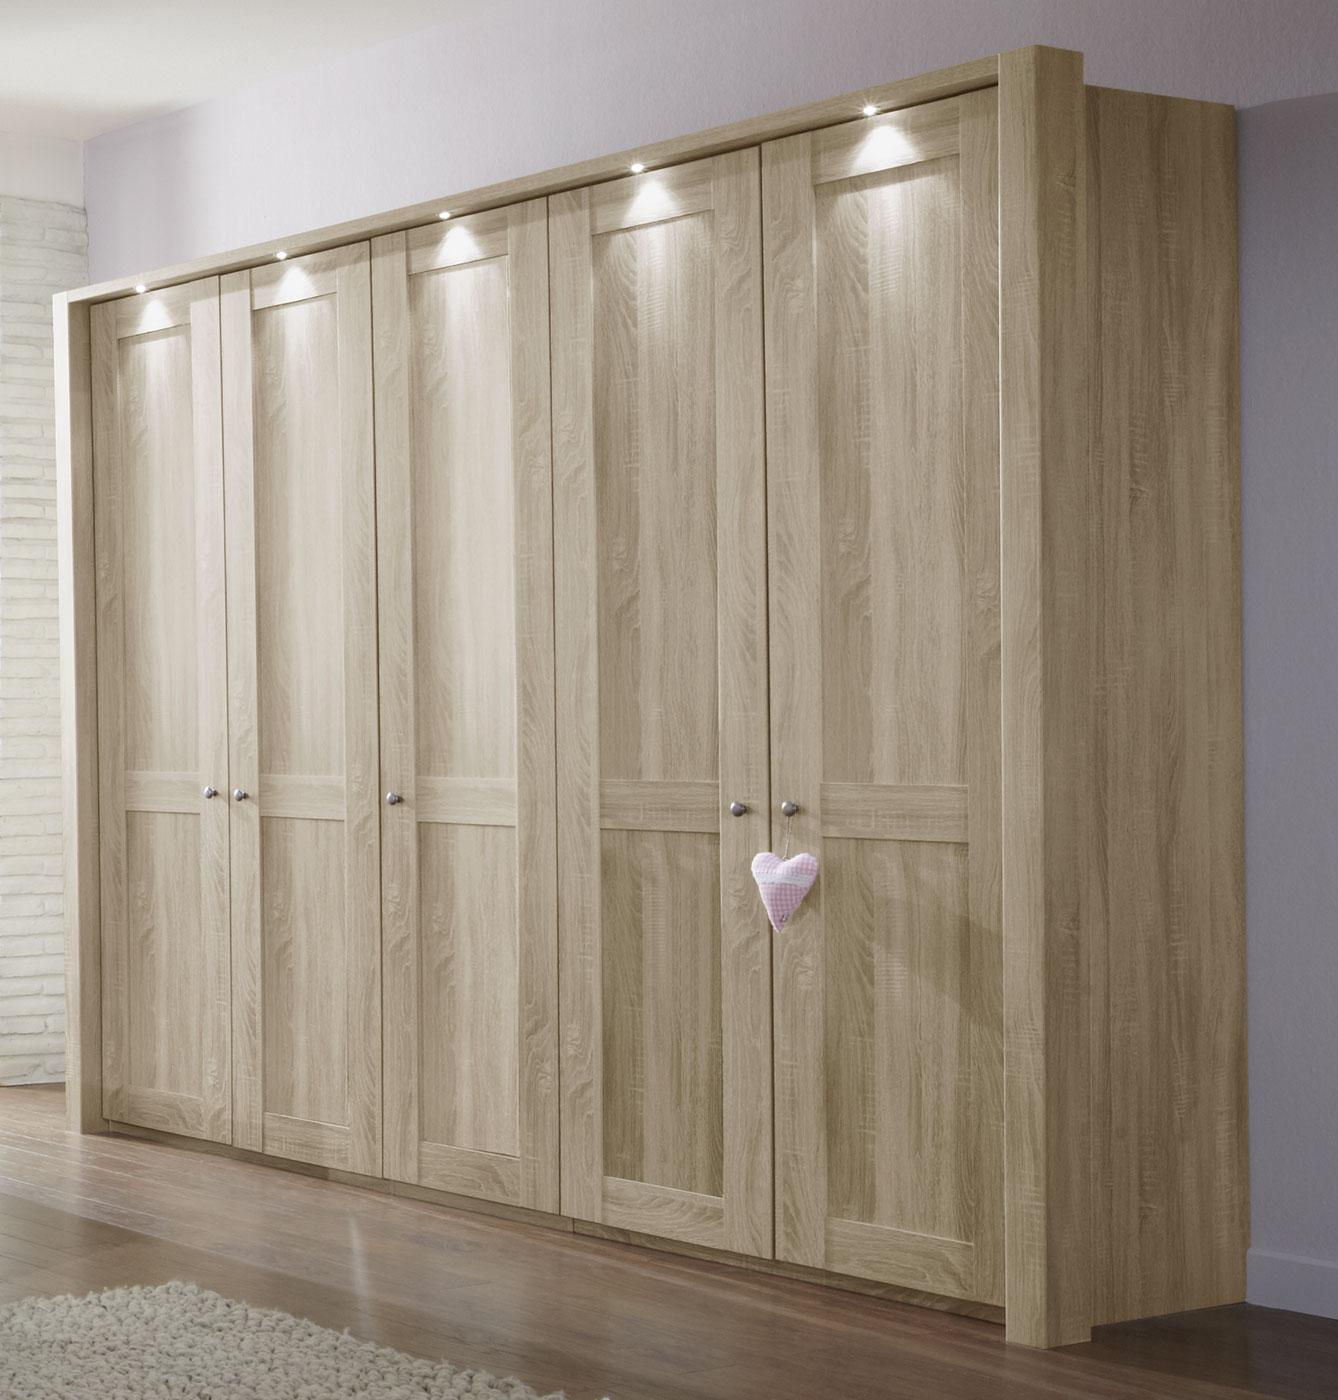 beleuchtung begehbarer kleiderschrank begehbarer kleiderschrank schranksysteme f r ordnung. Black Bedroom Furniture Sets. Home Design Ideas